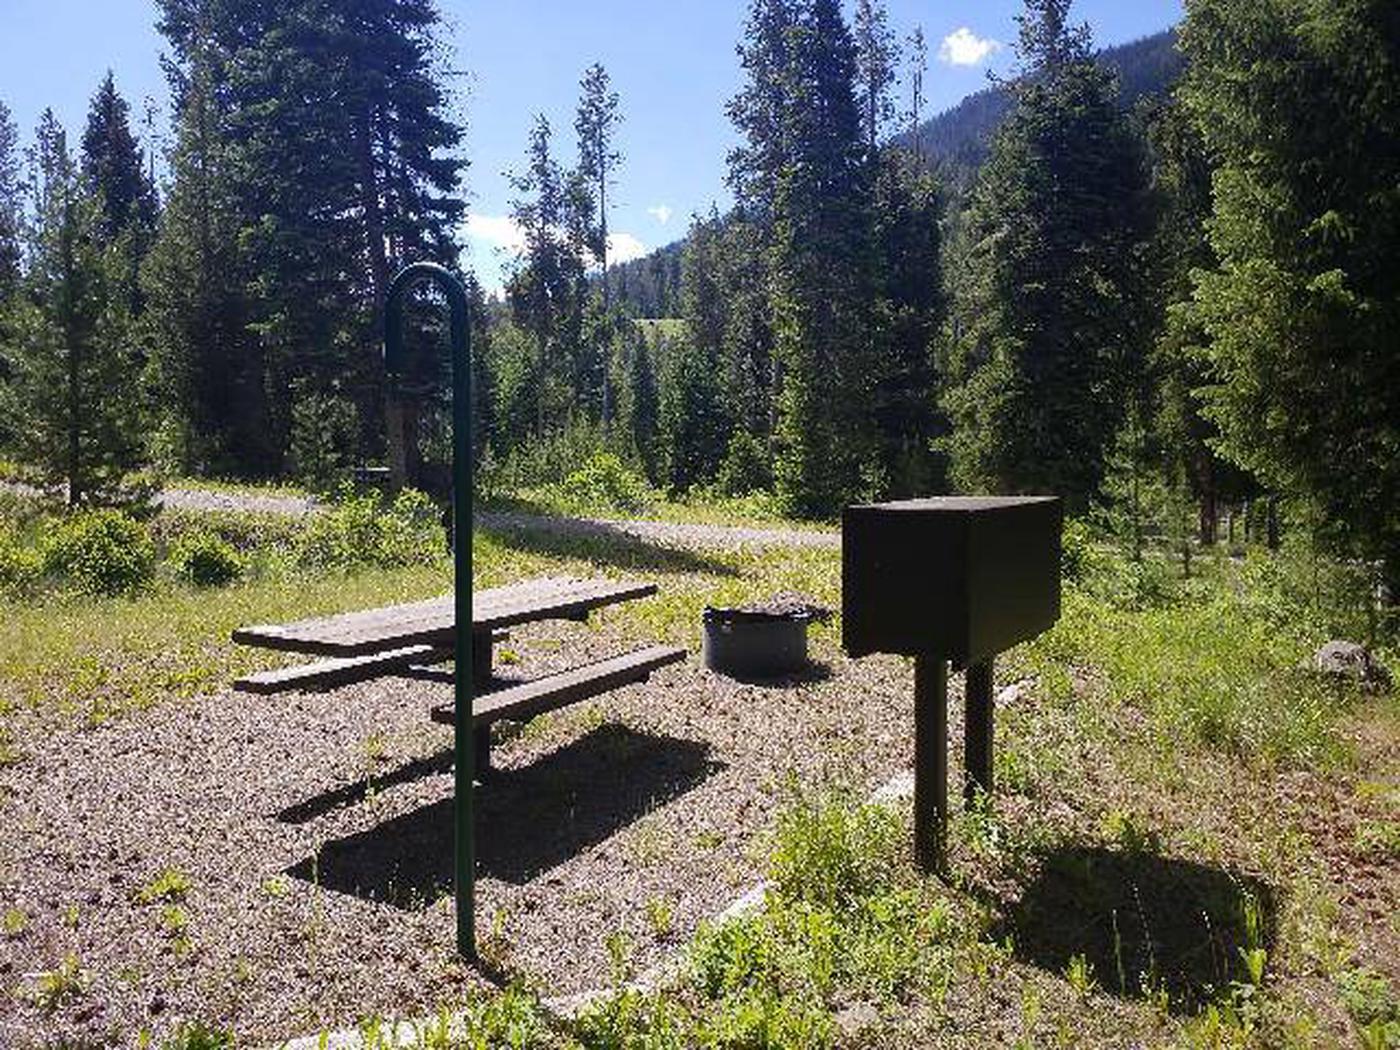 Threemile Campground Campsite 8 - Back View